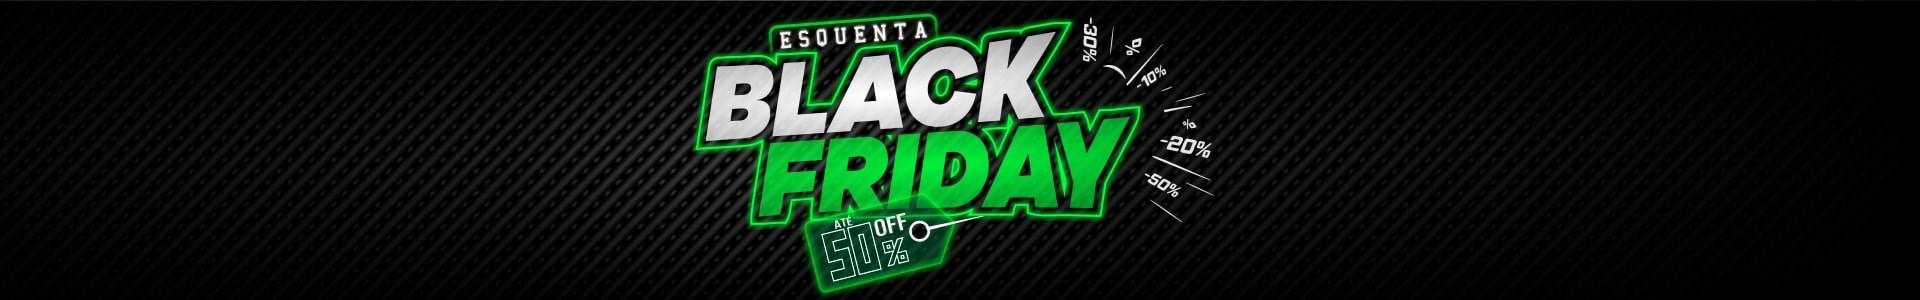 Esquenta Black Friday